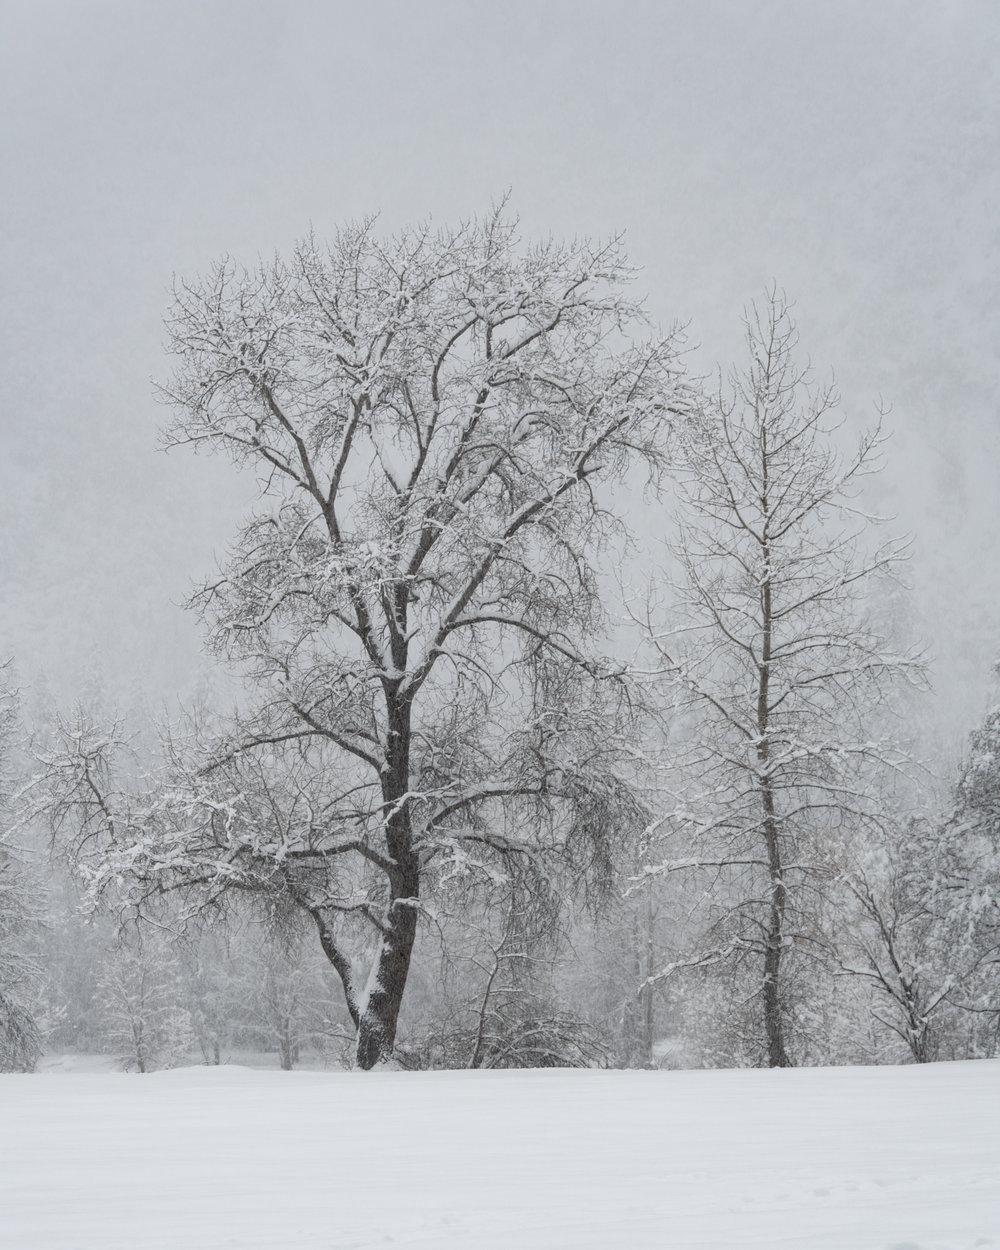 My Favorite Tree - Yosemite National Park